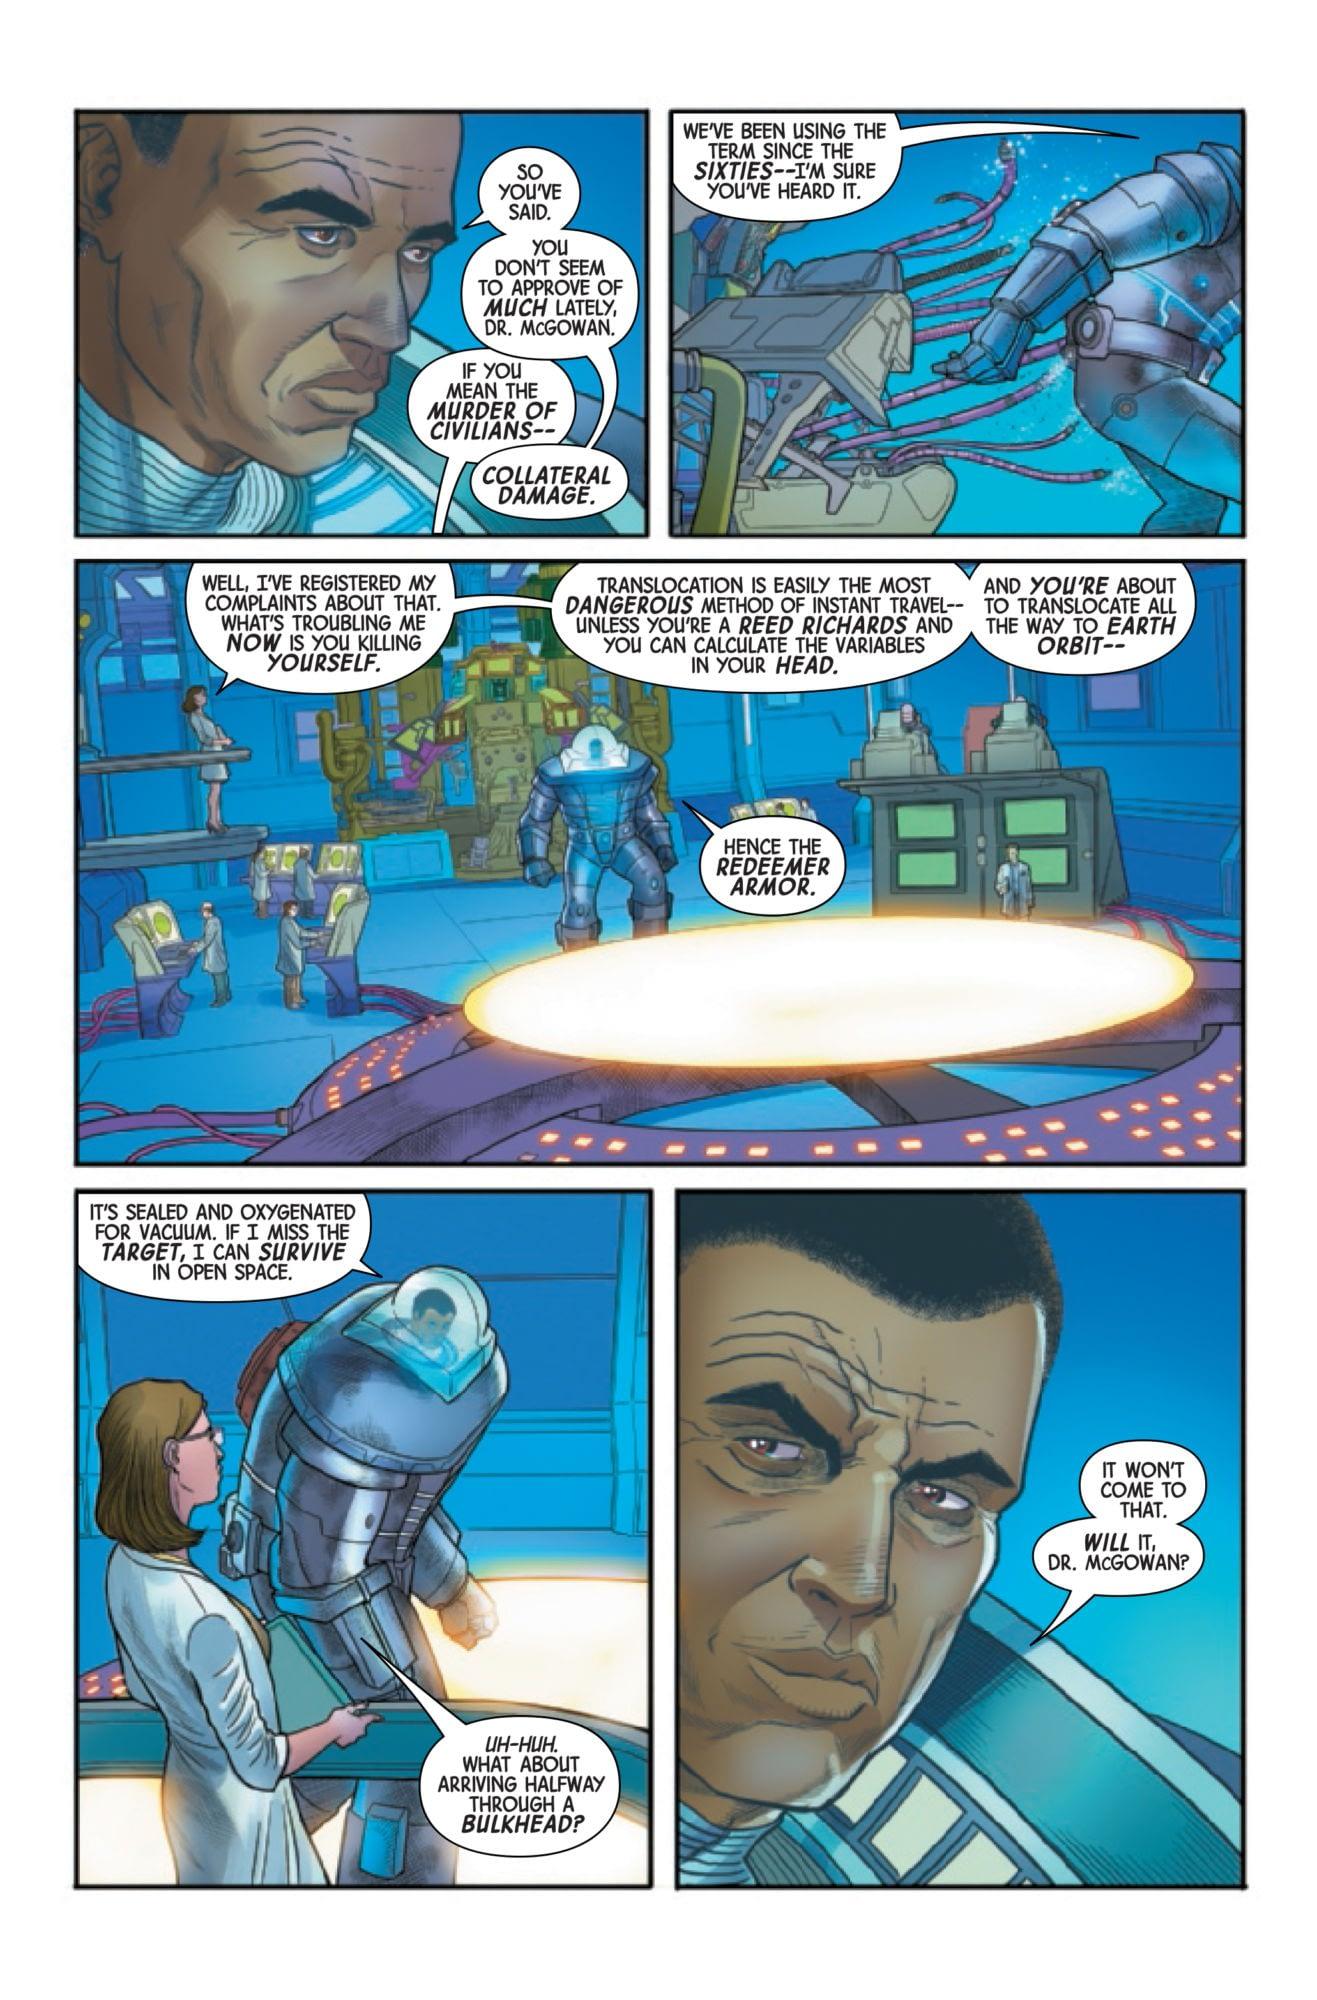 Immortal Hulk #21 - Back to Hulk's 2005 Origins [Preview]